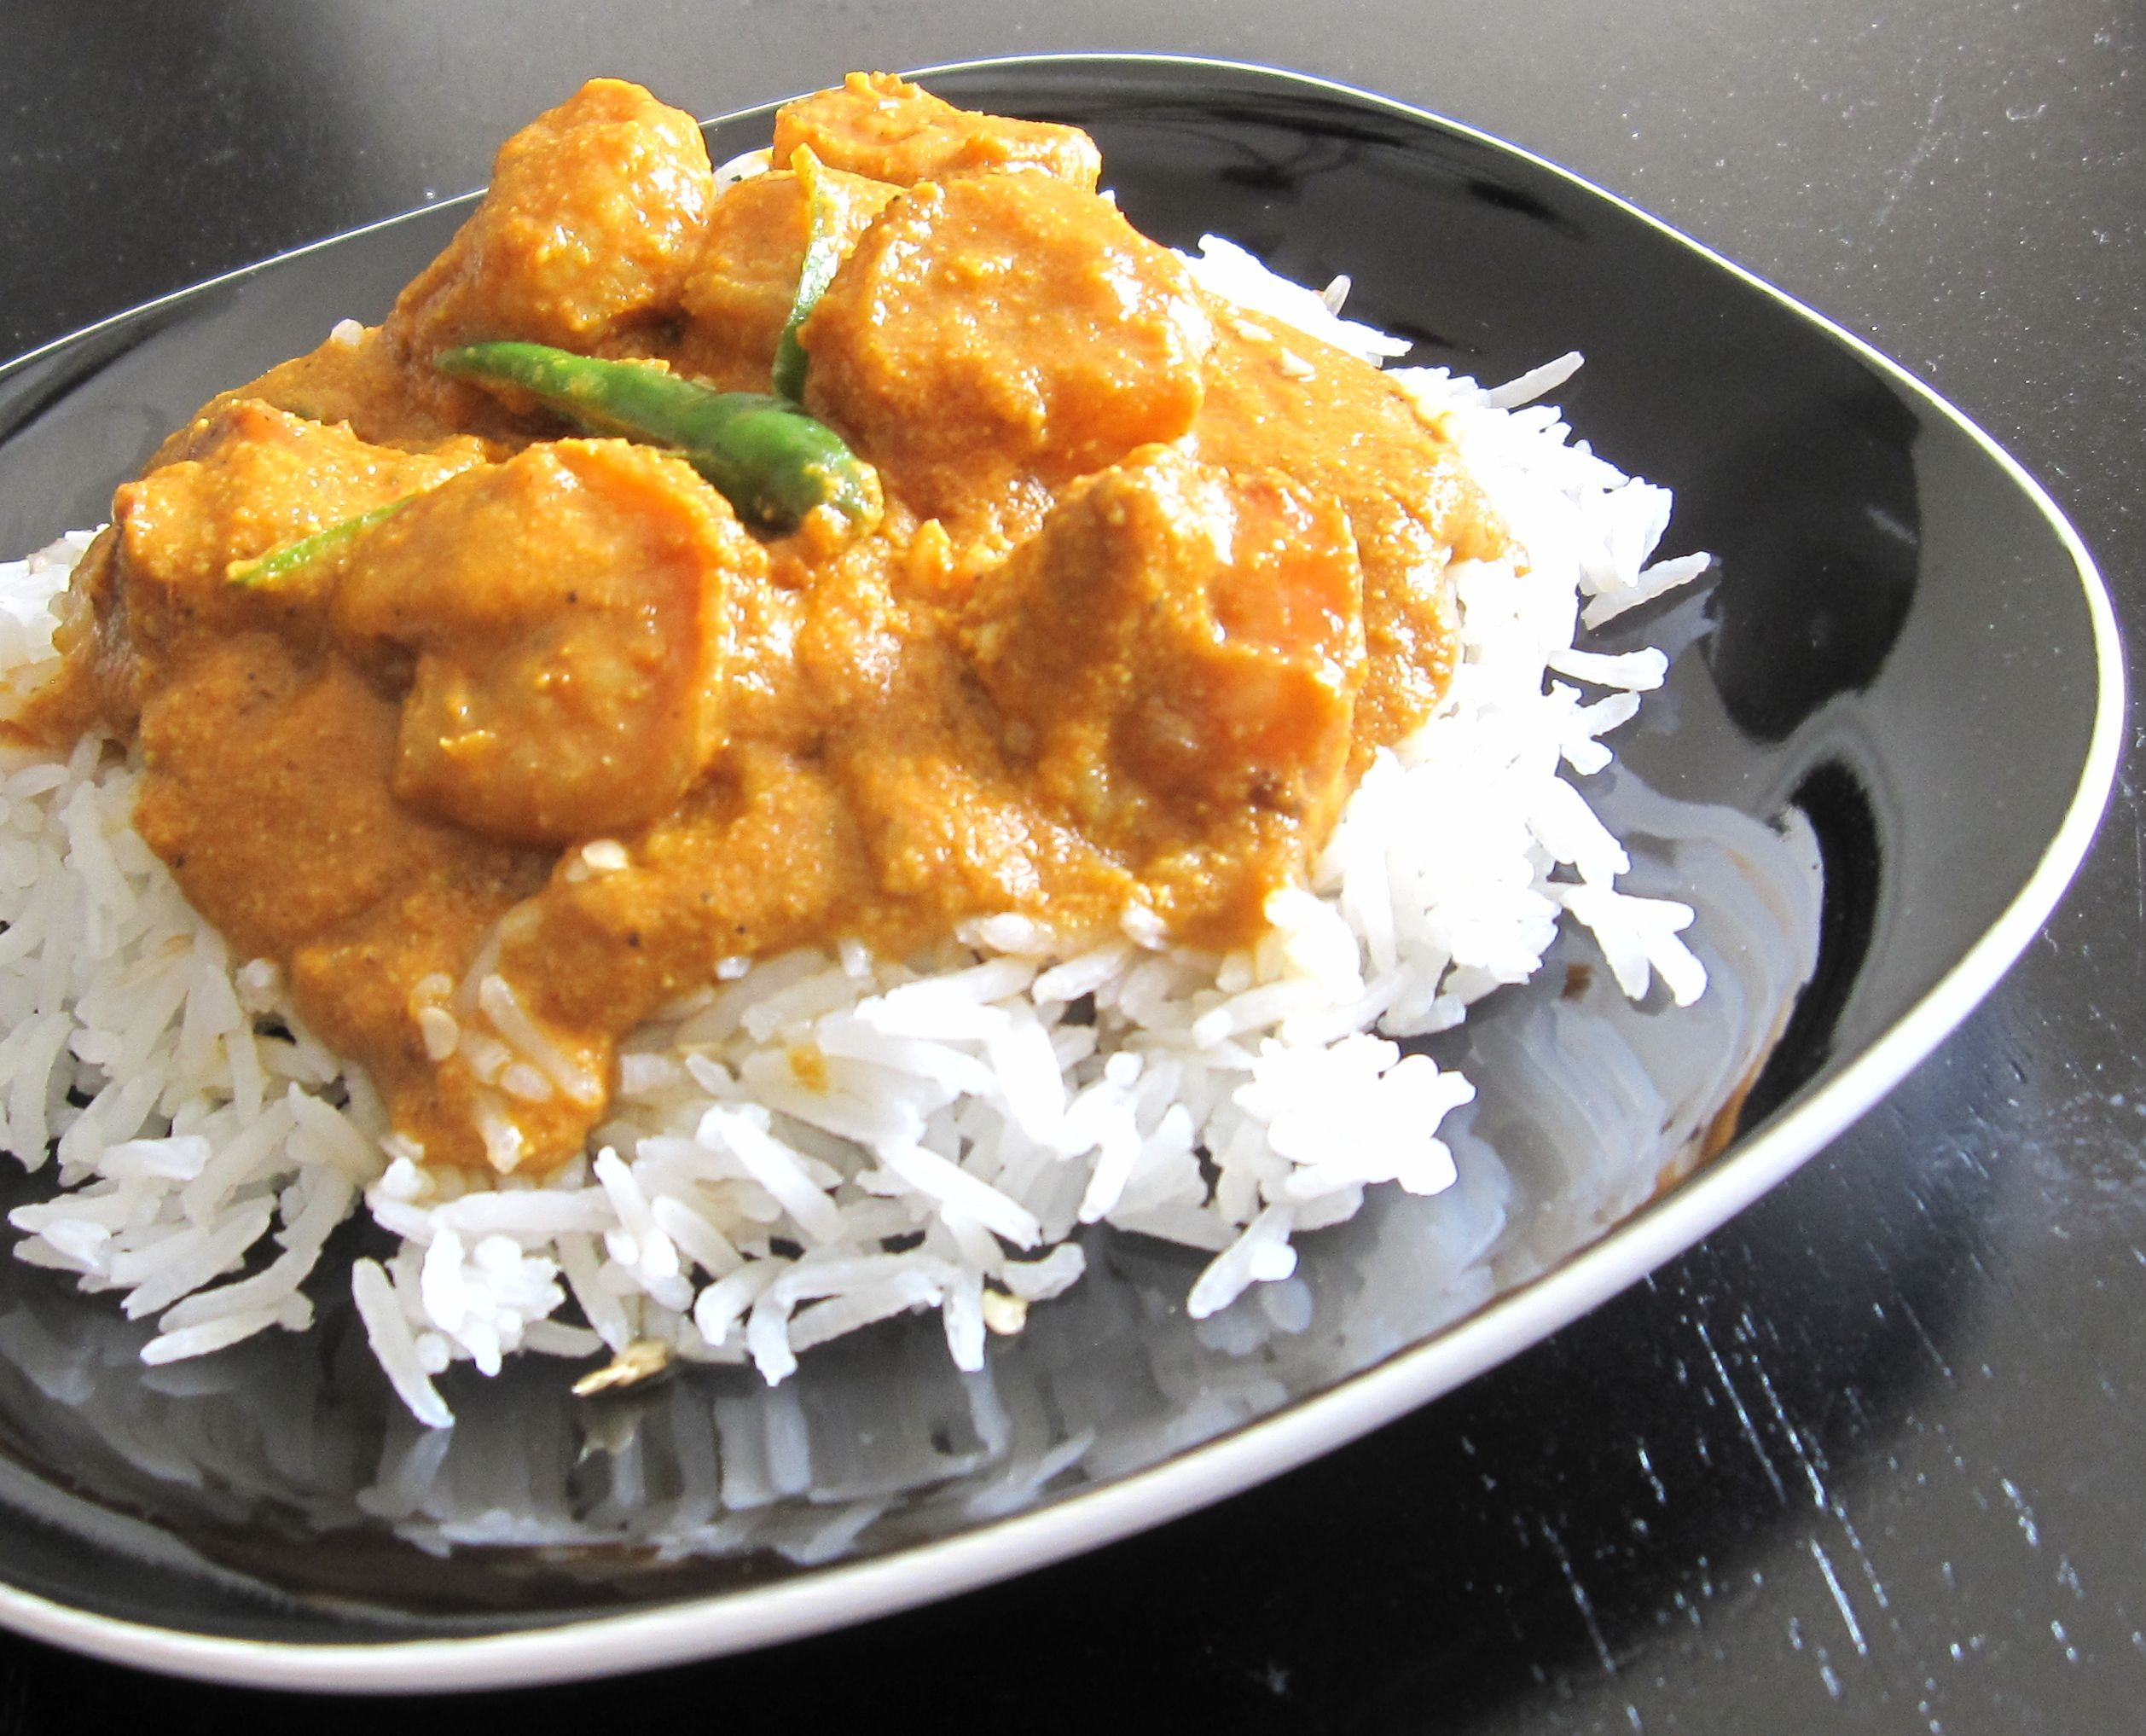 Cooking class in goa st 2 india pinterest goan for Goan fish curry recipe